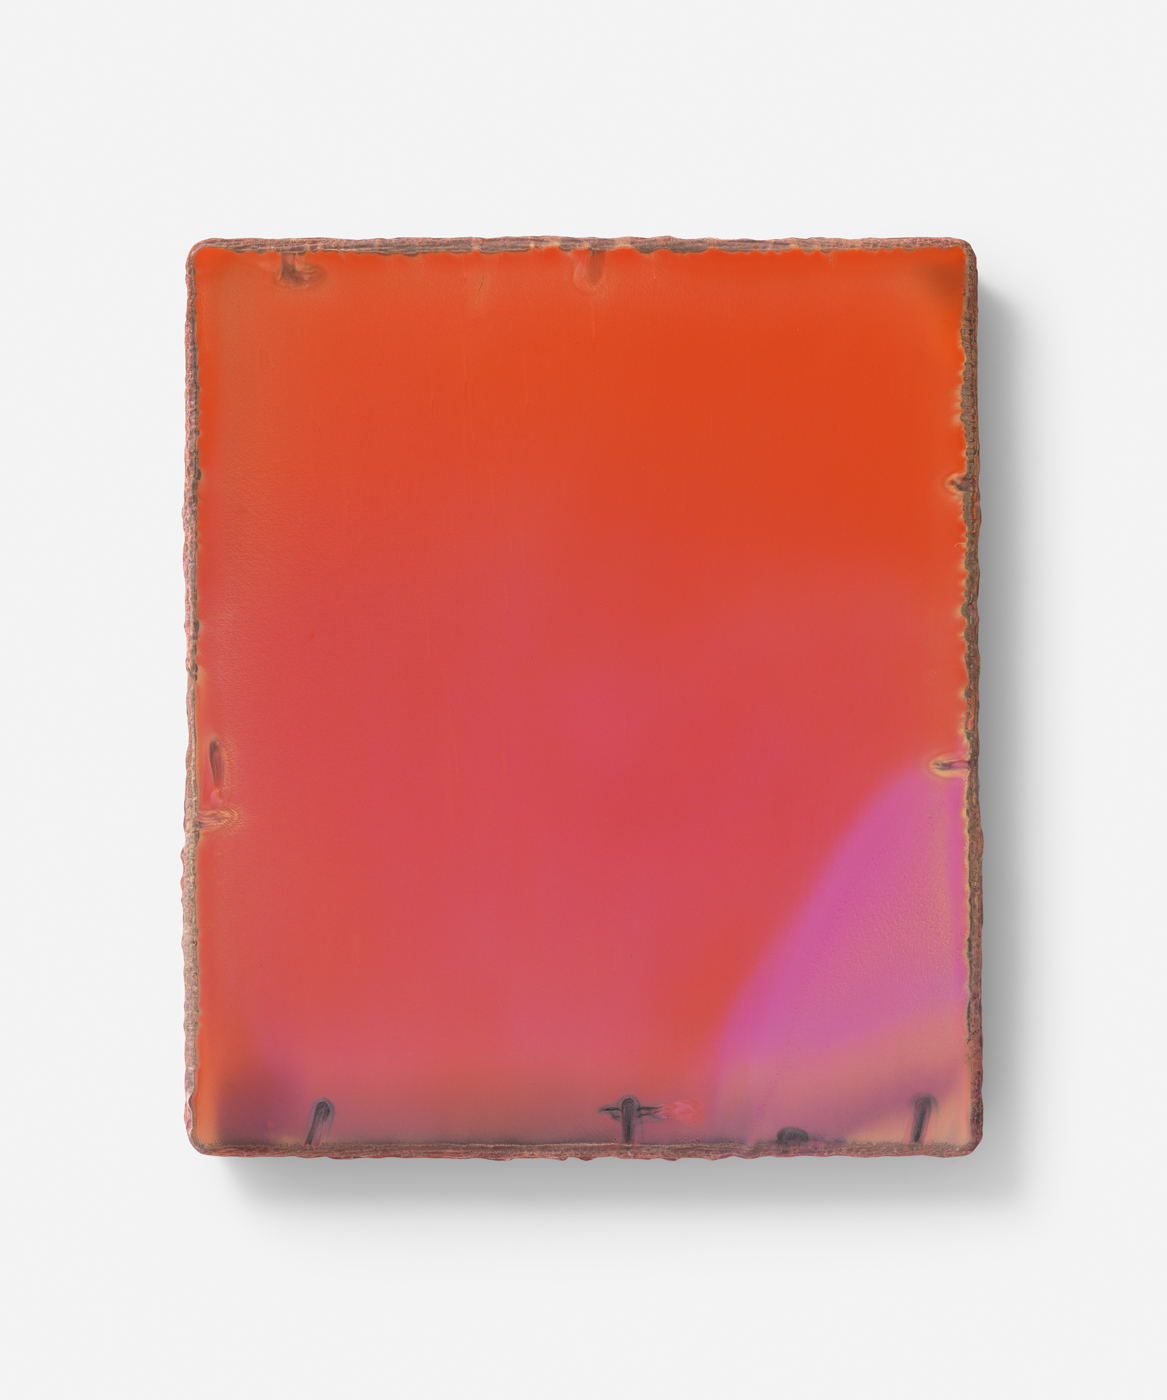 Untitled 2014 Oil on gesso board 35 x 30 cm / 13.7 x 11.8 in